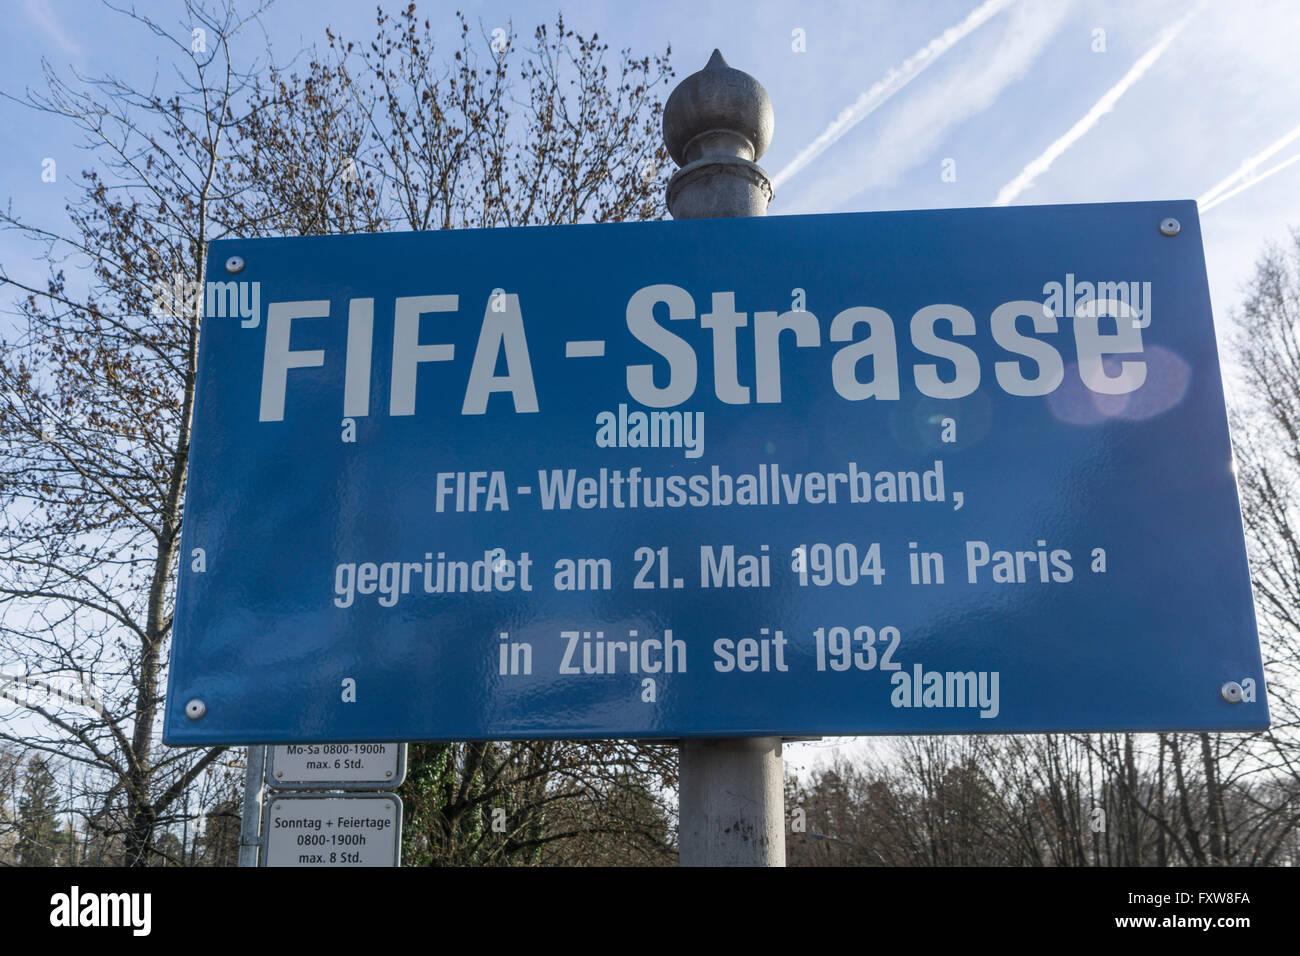 Fifa Street,  Fédération Internationale de Football Association, Zurich - Stock Image